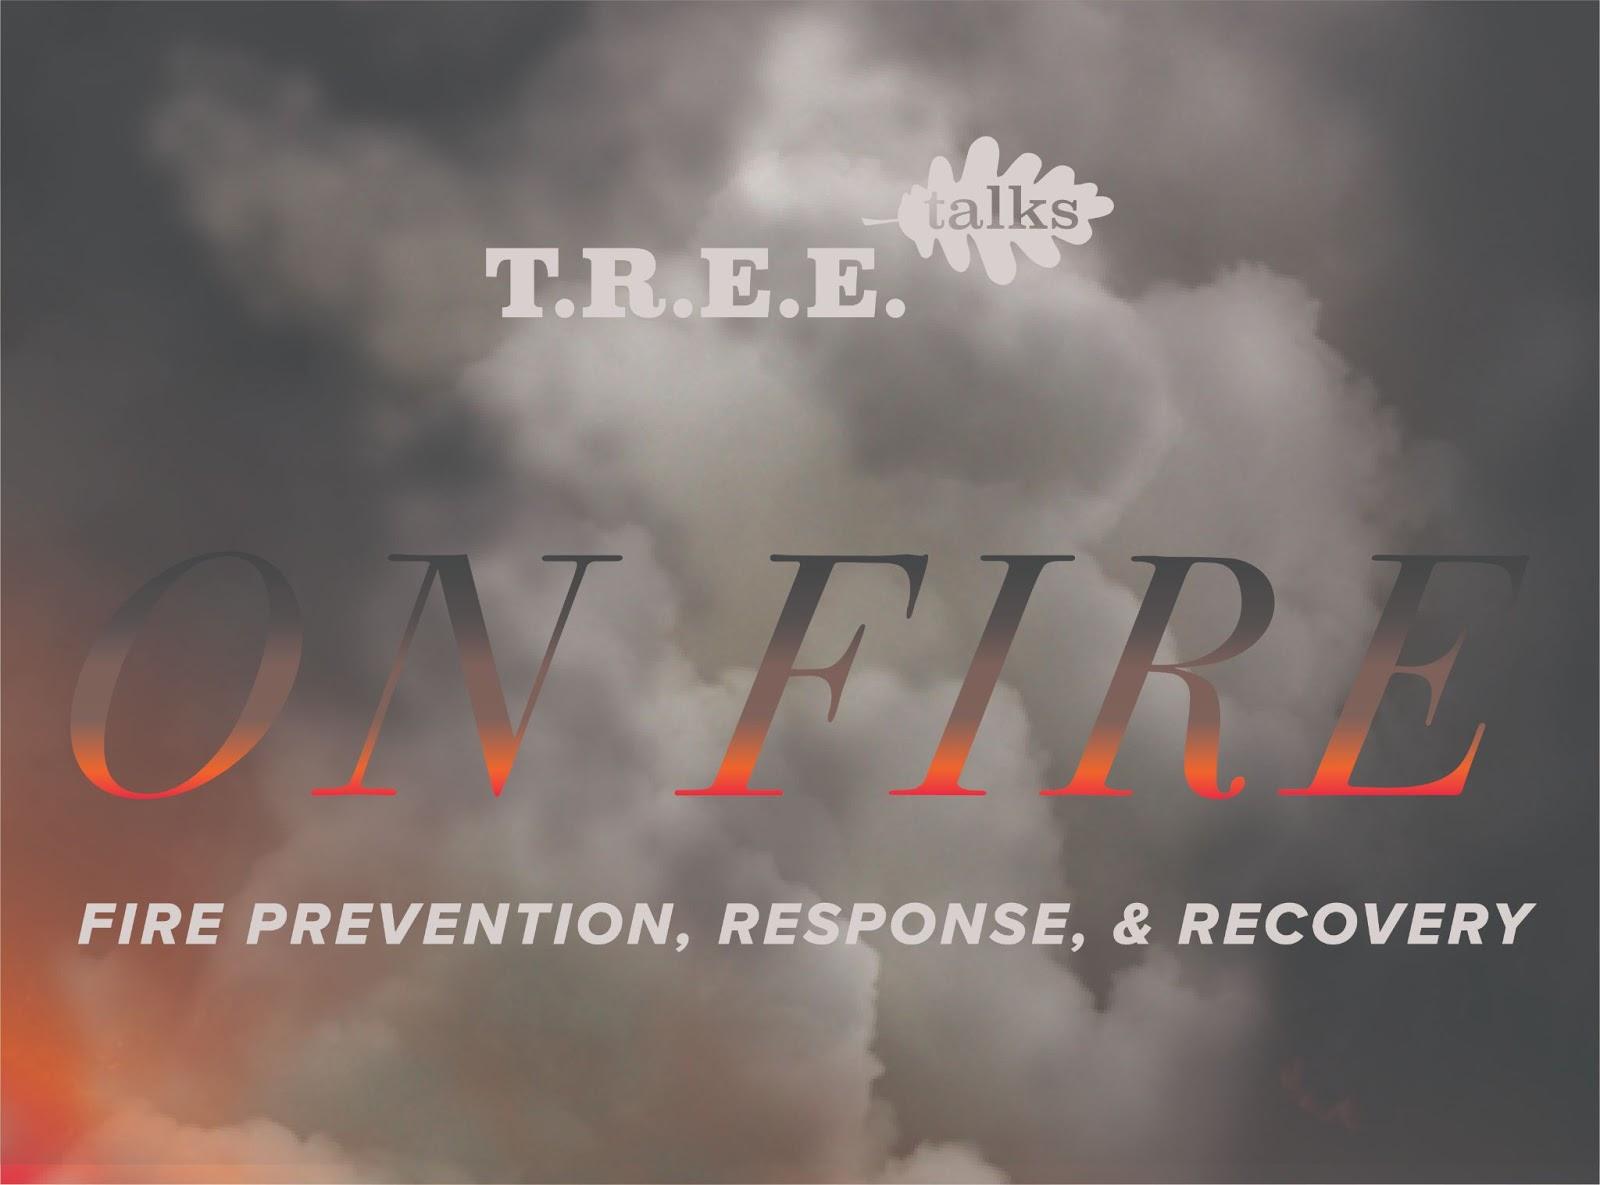 T.R.E.E. Talks On Fire